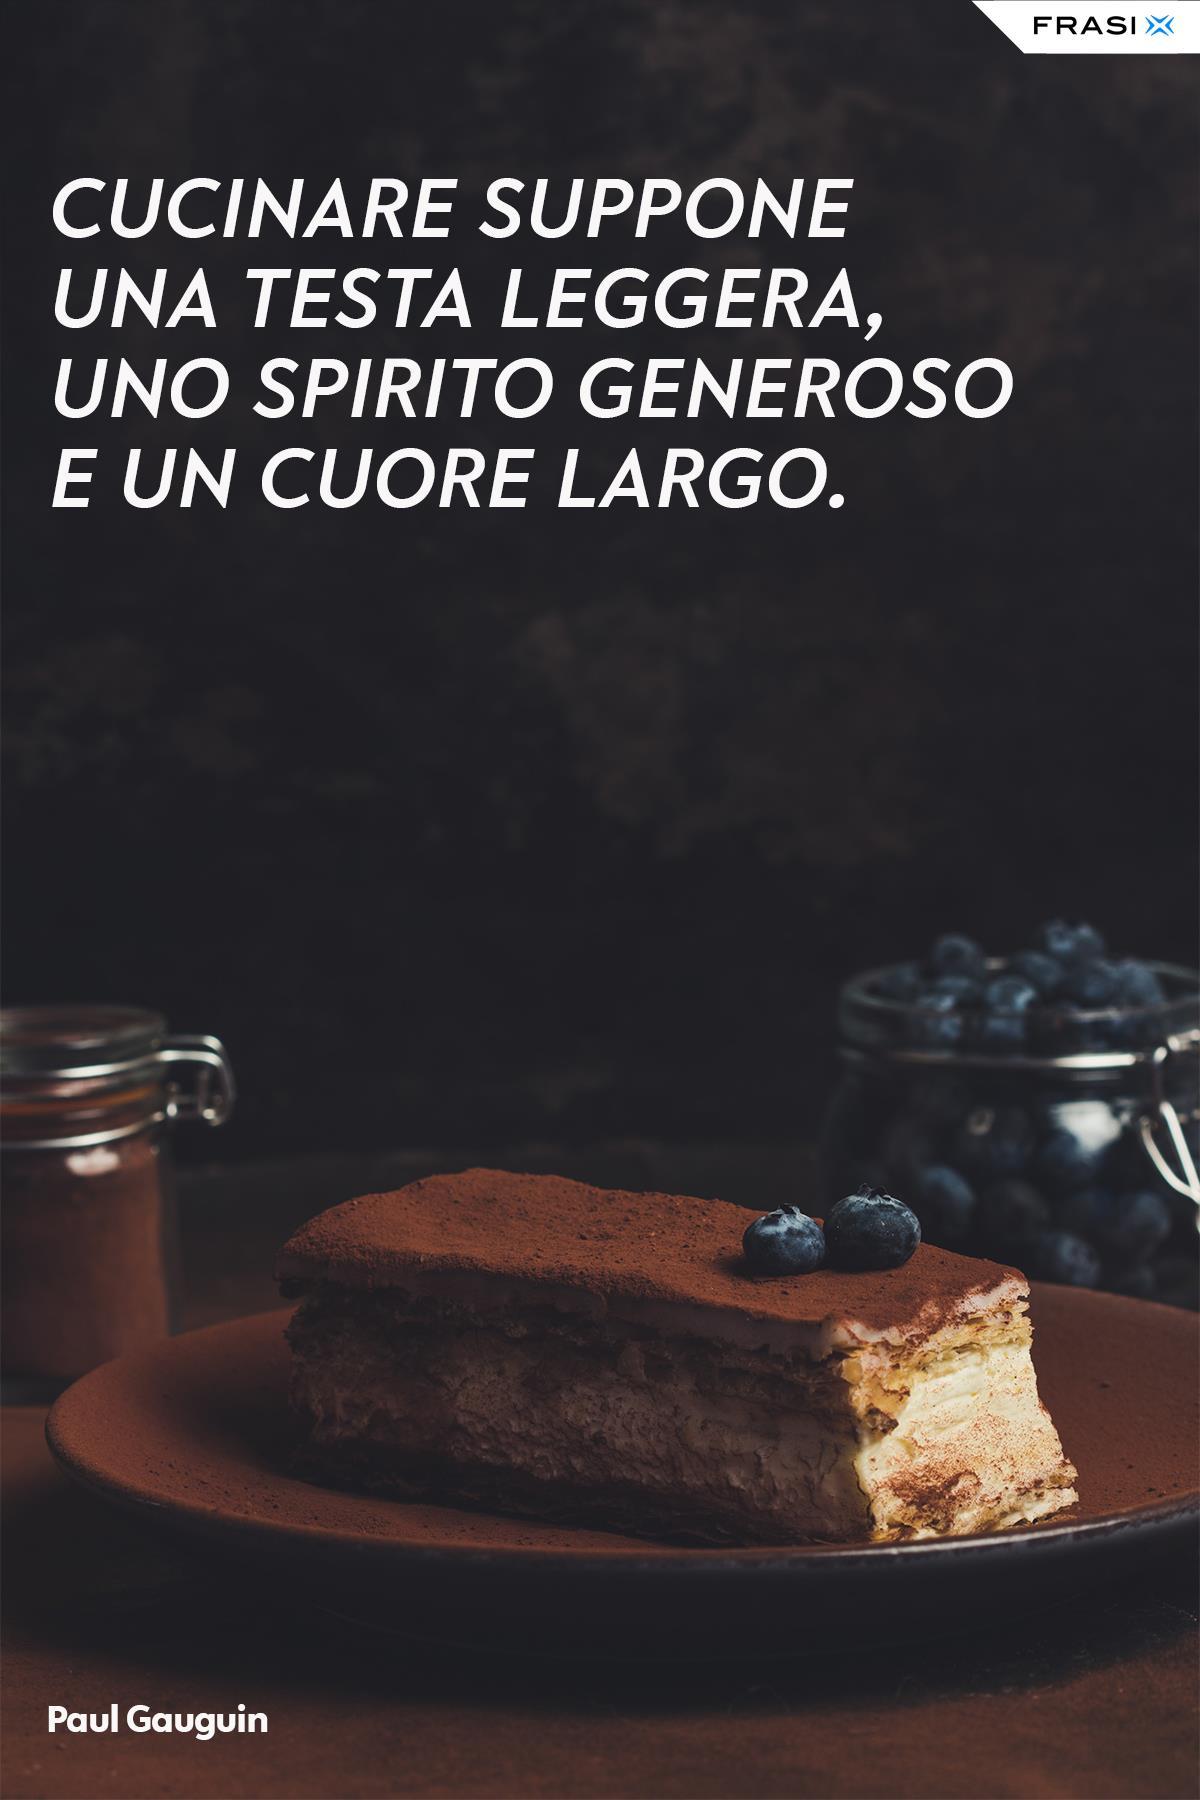 Frasi sul cucinare torte cuore di Paul Gauguin